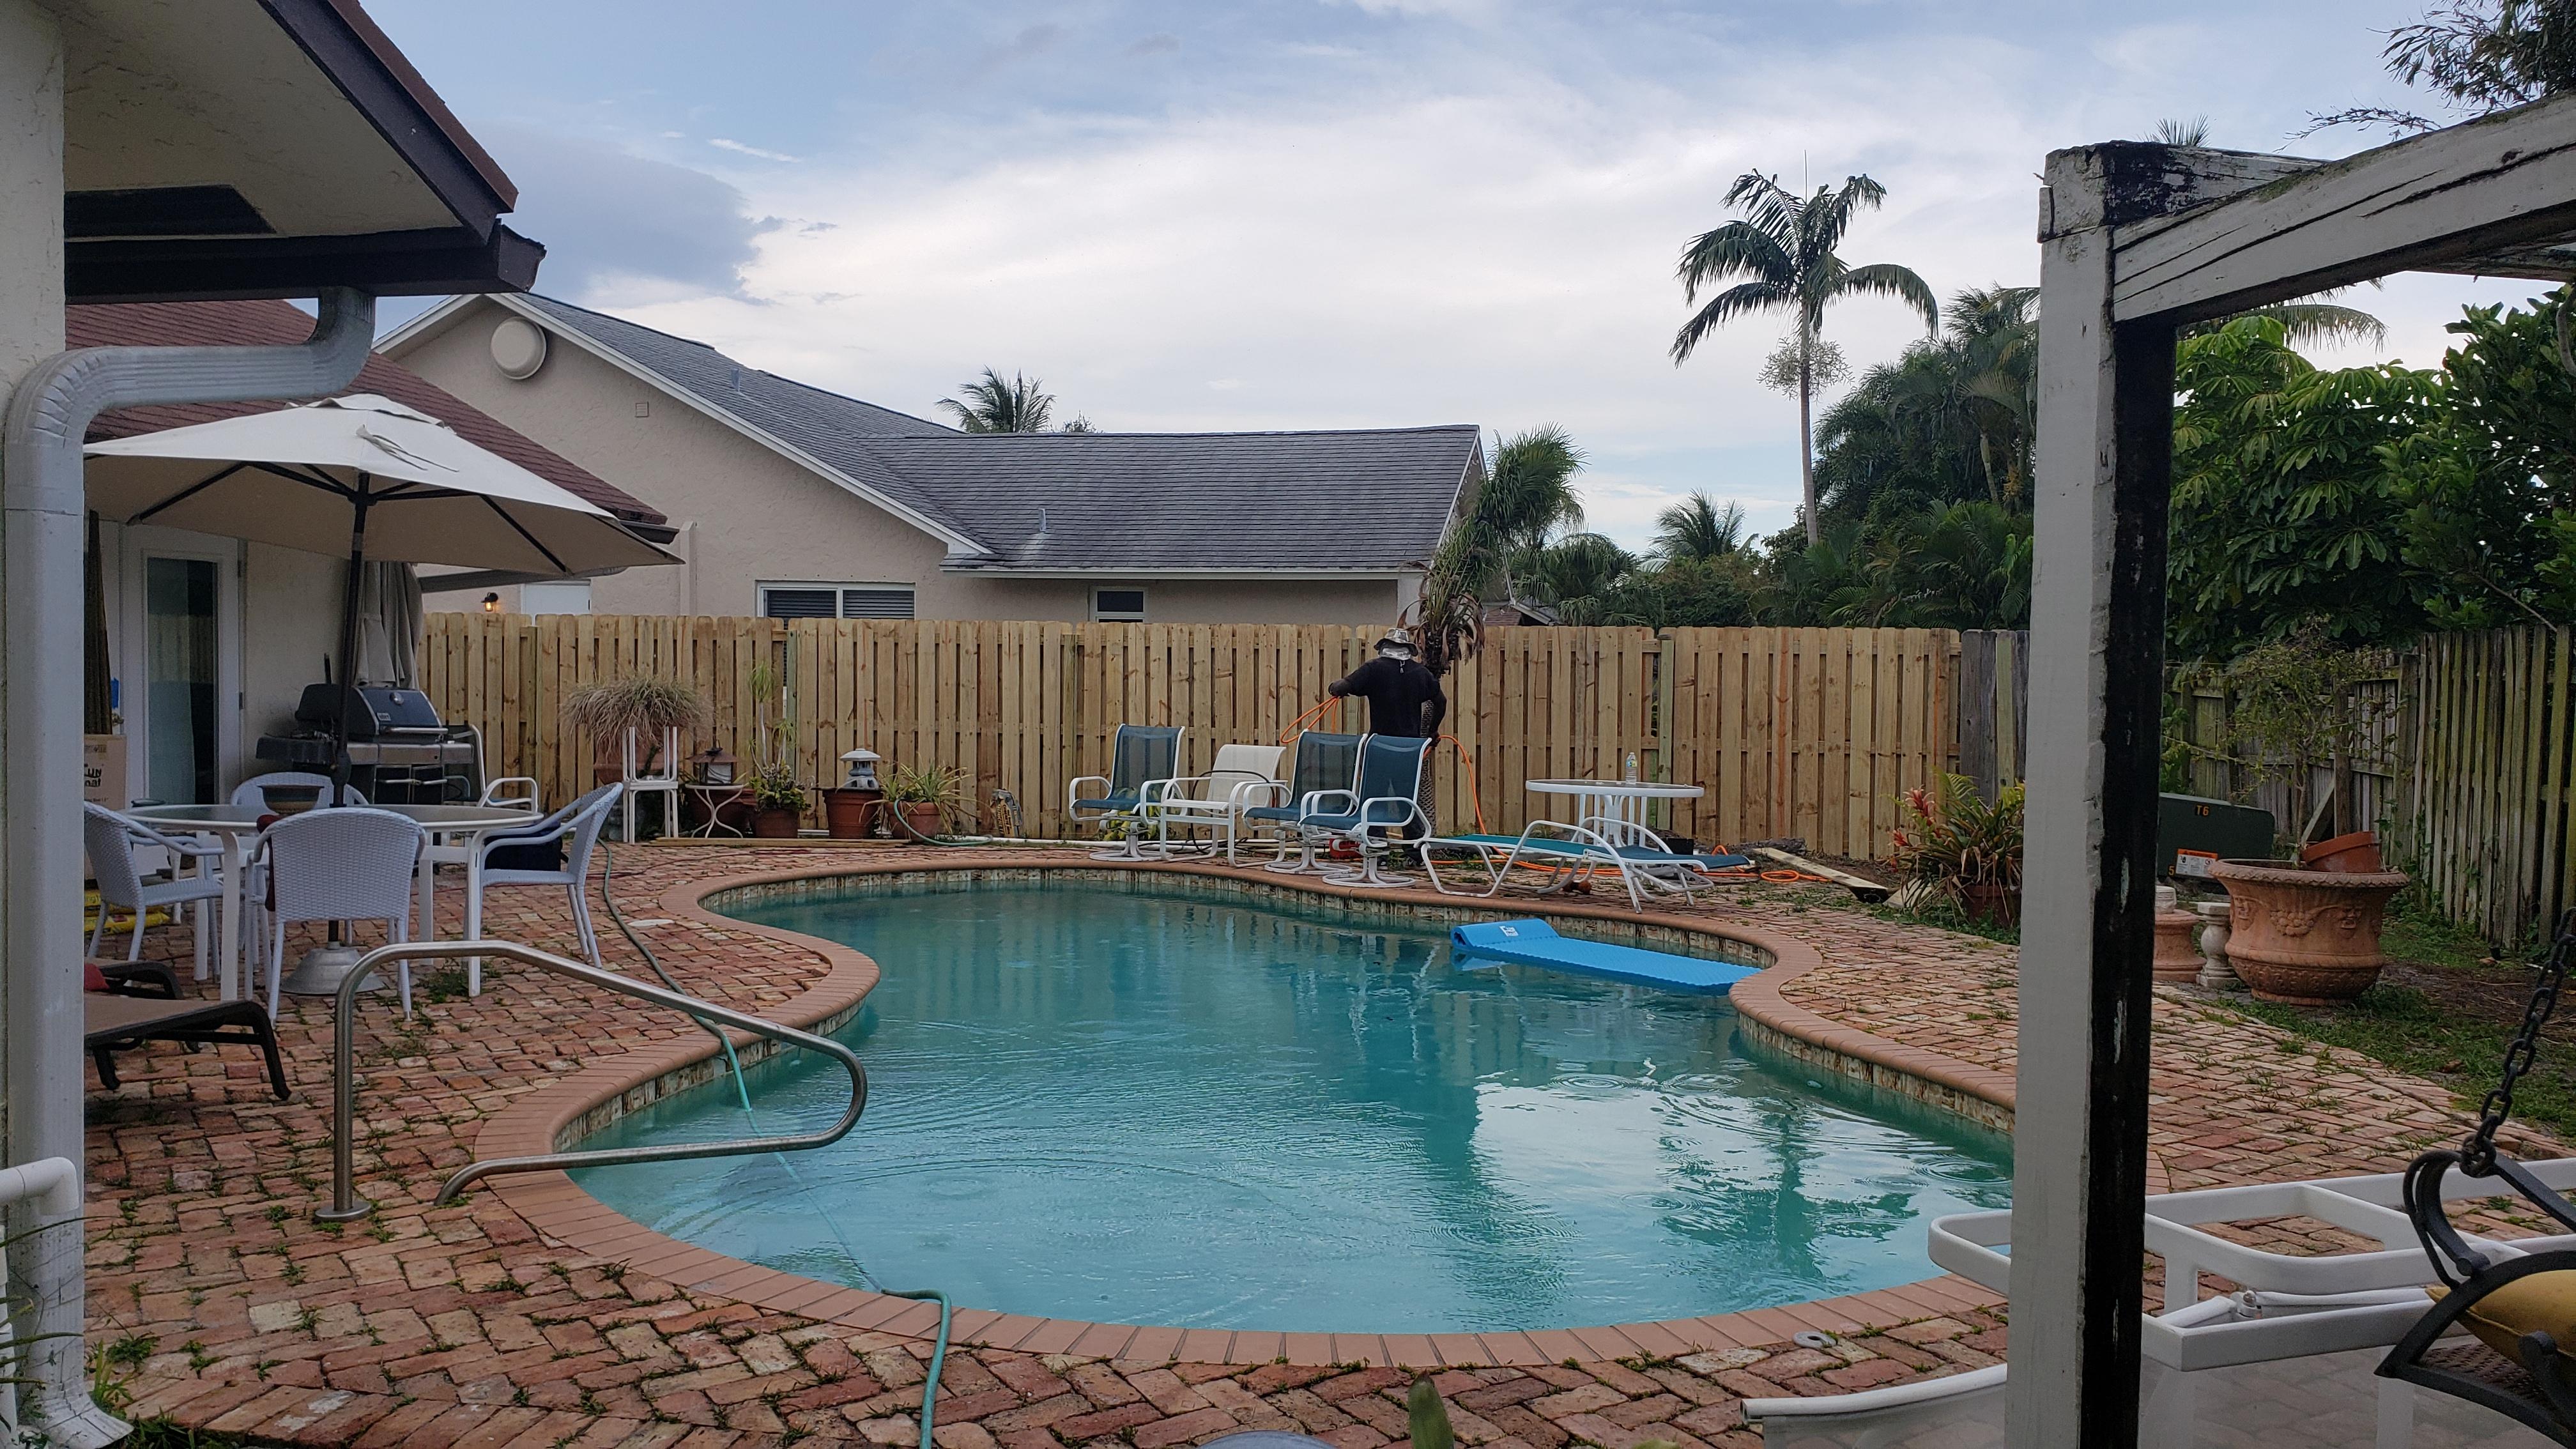 Houston pool fence installation experts